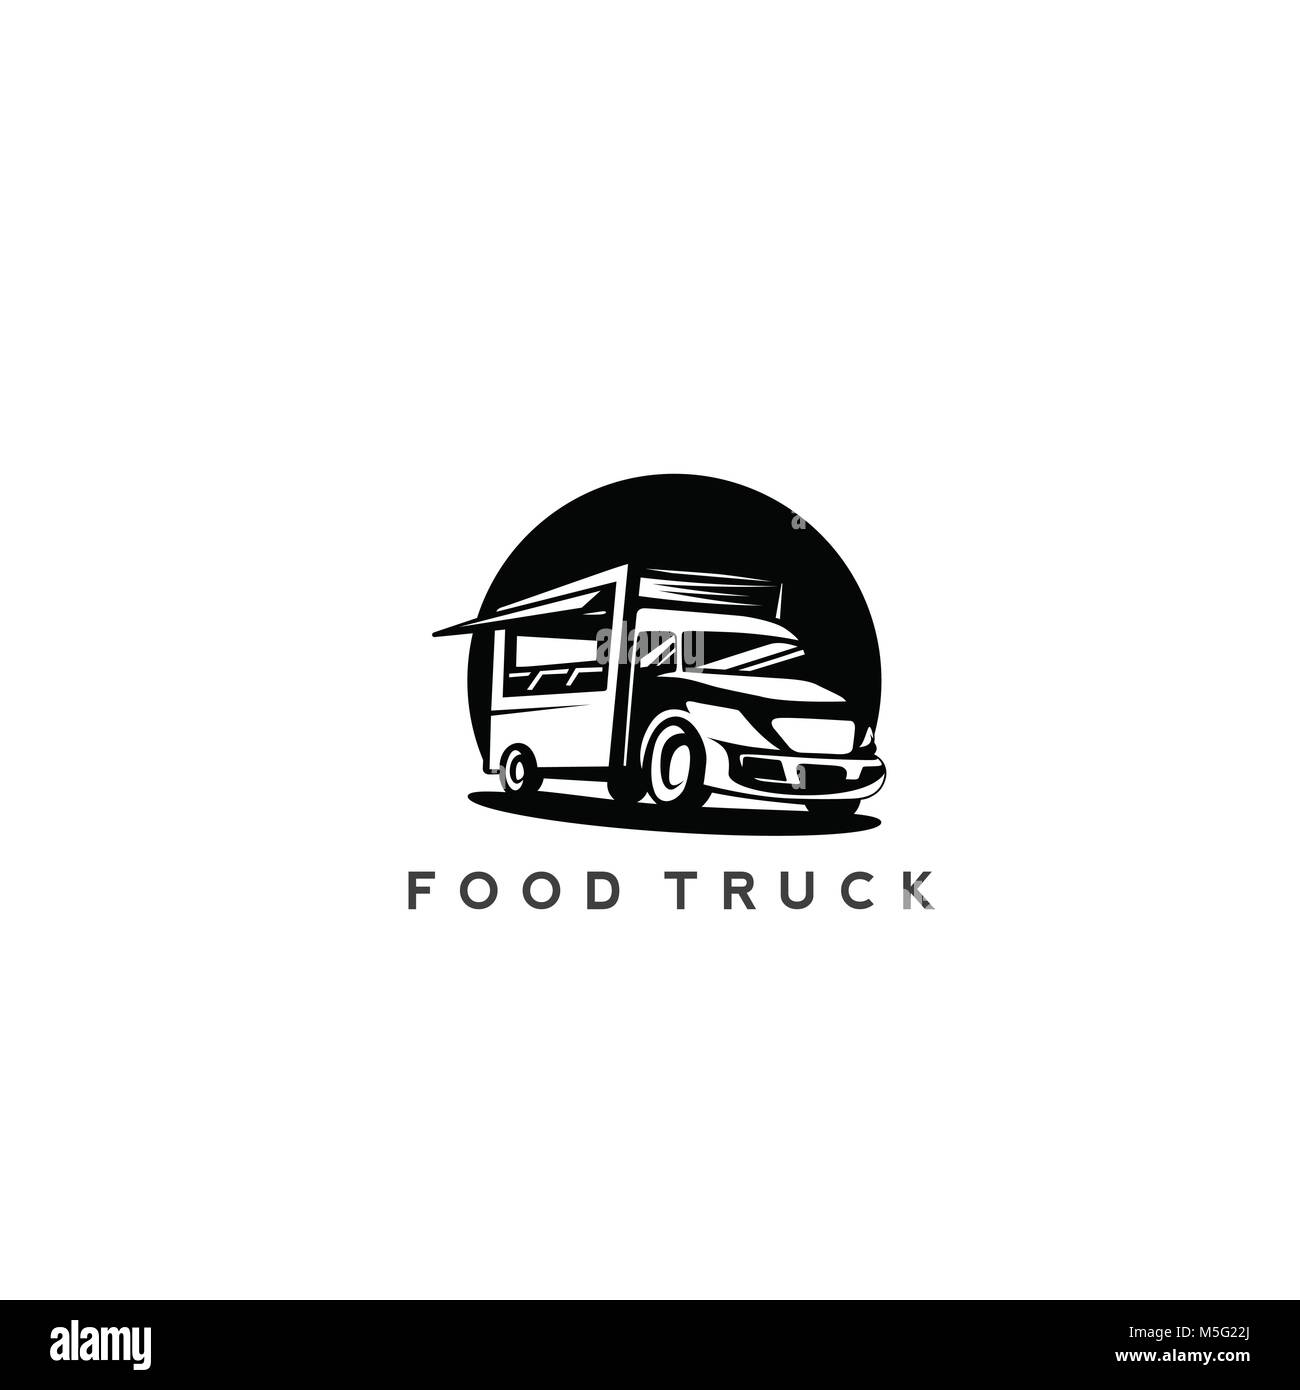 minimal black color food truck logo vector. - Stock Image